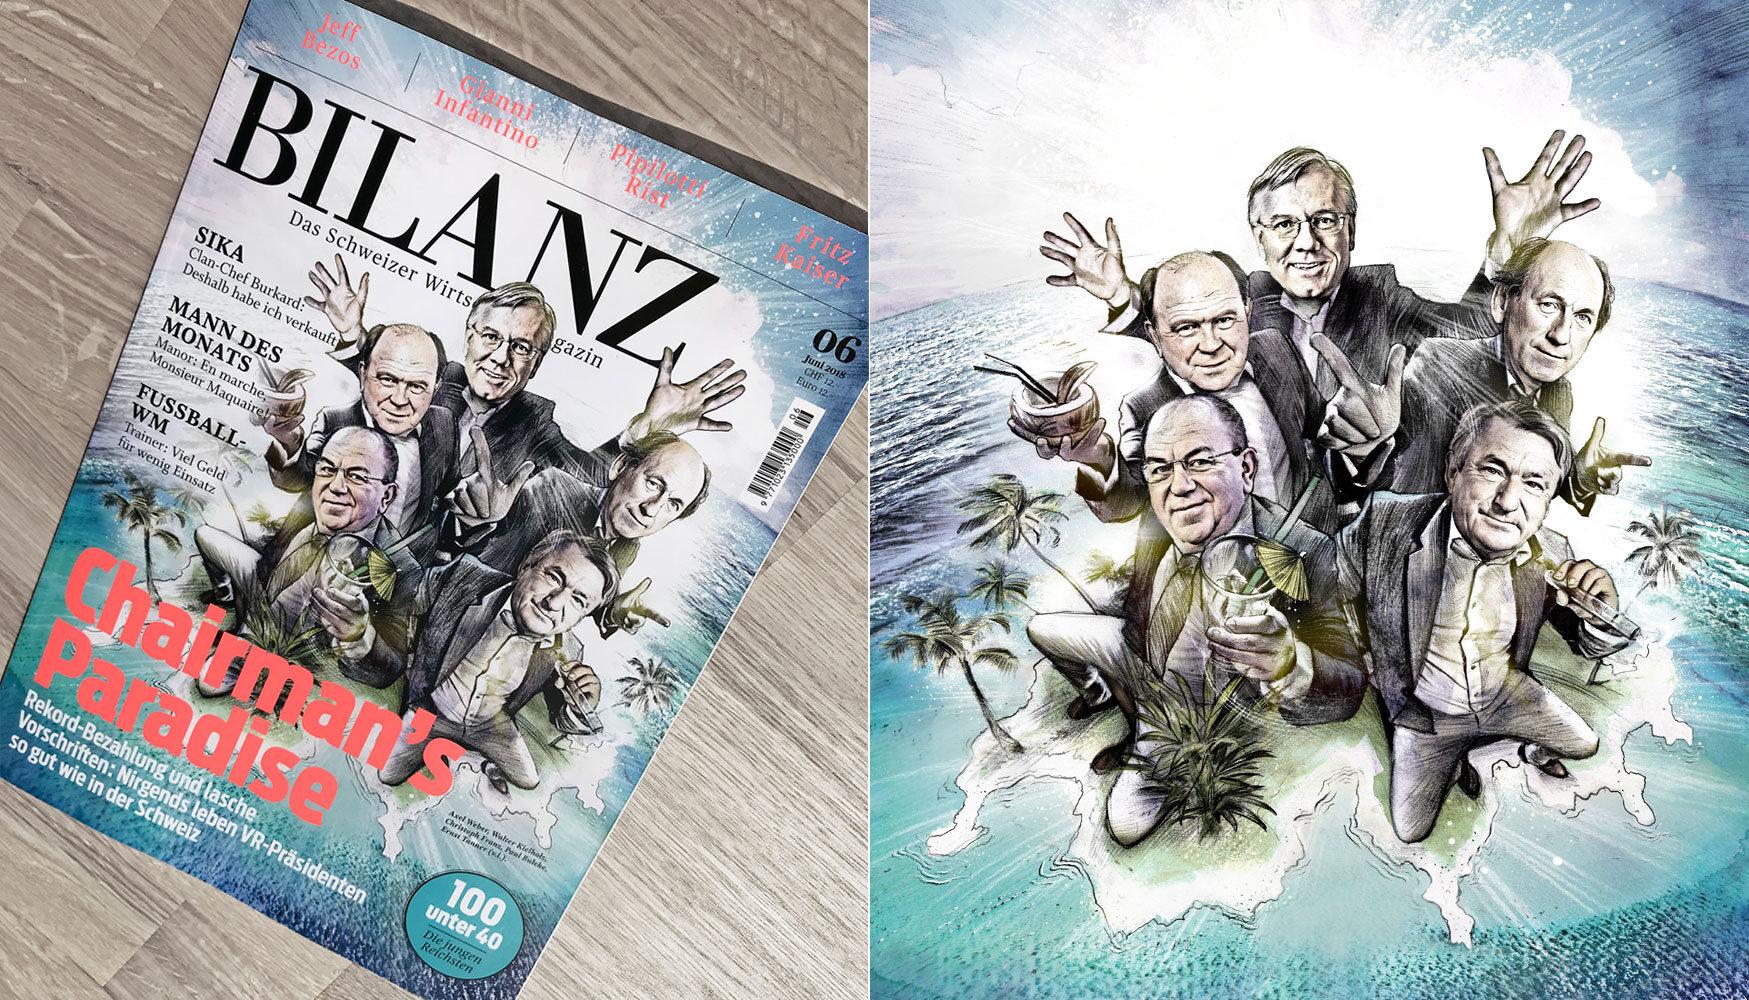 Bilanz Illustration - Kornel Illustration | Kornel Stadler portfolio